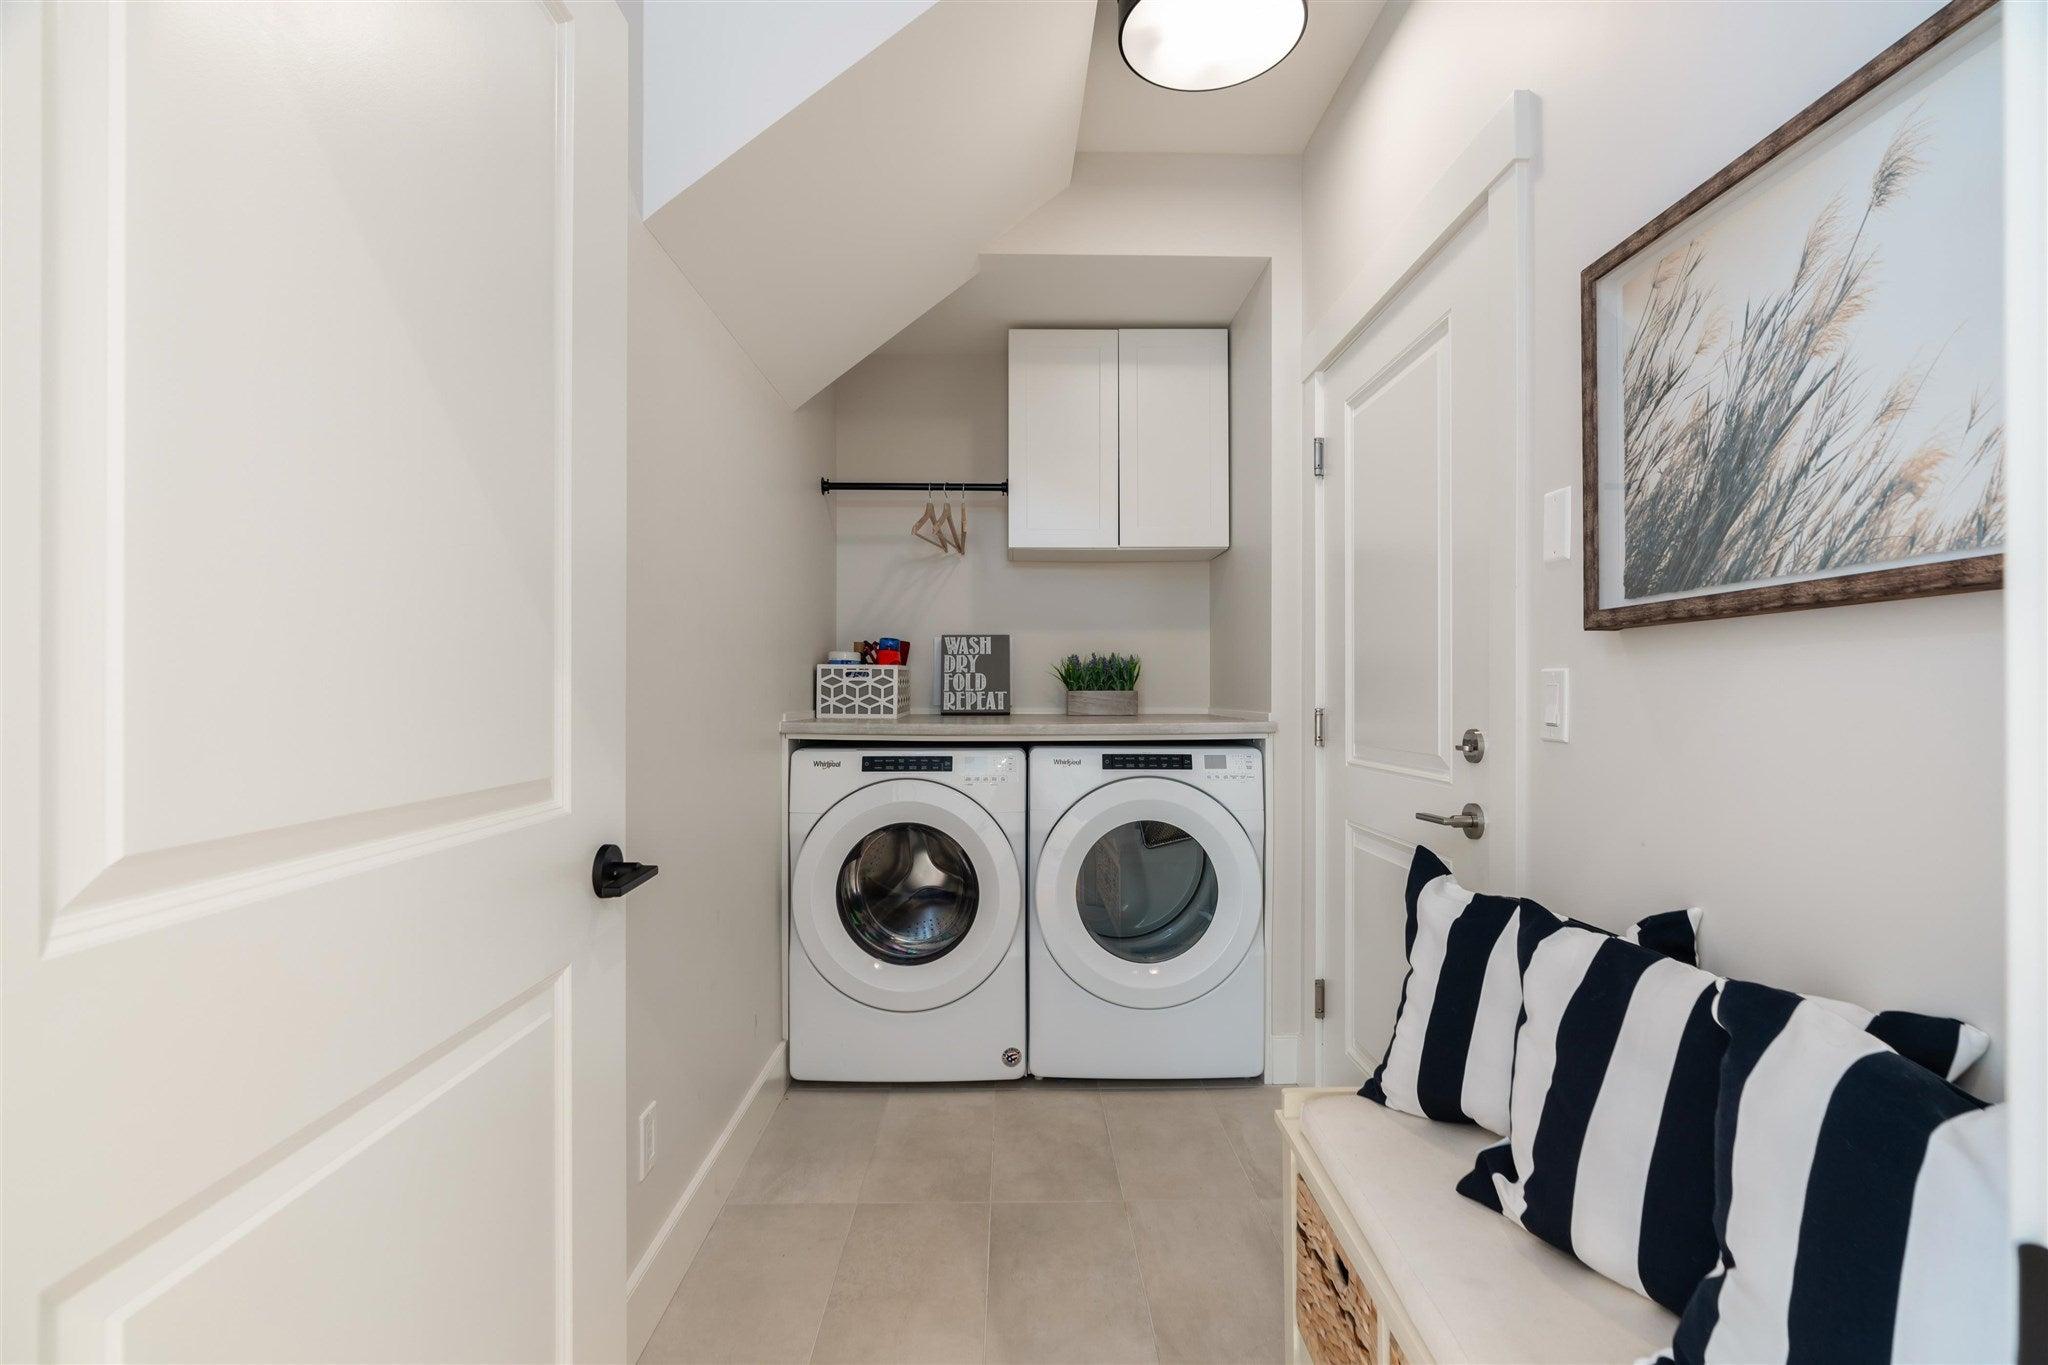 40 21858 47B AVENUE - Murrayville Townhouse for sale, 4 Bedrooms (R2603956) - #19